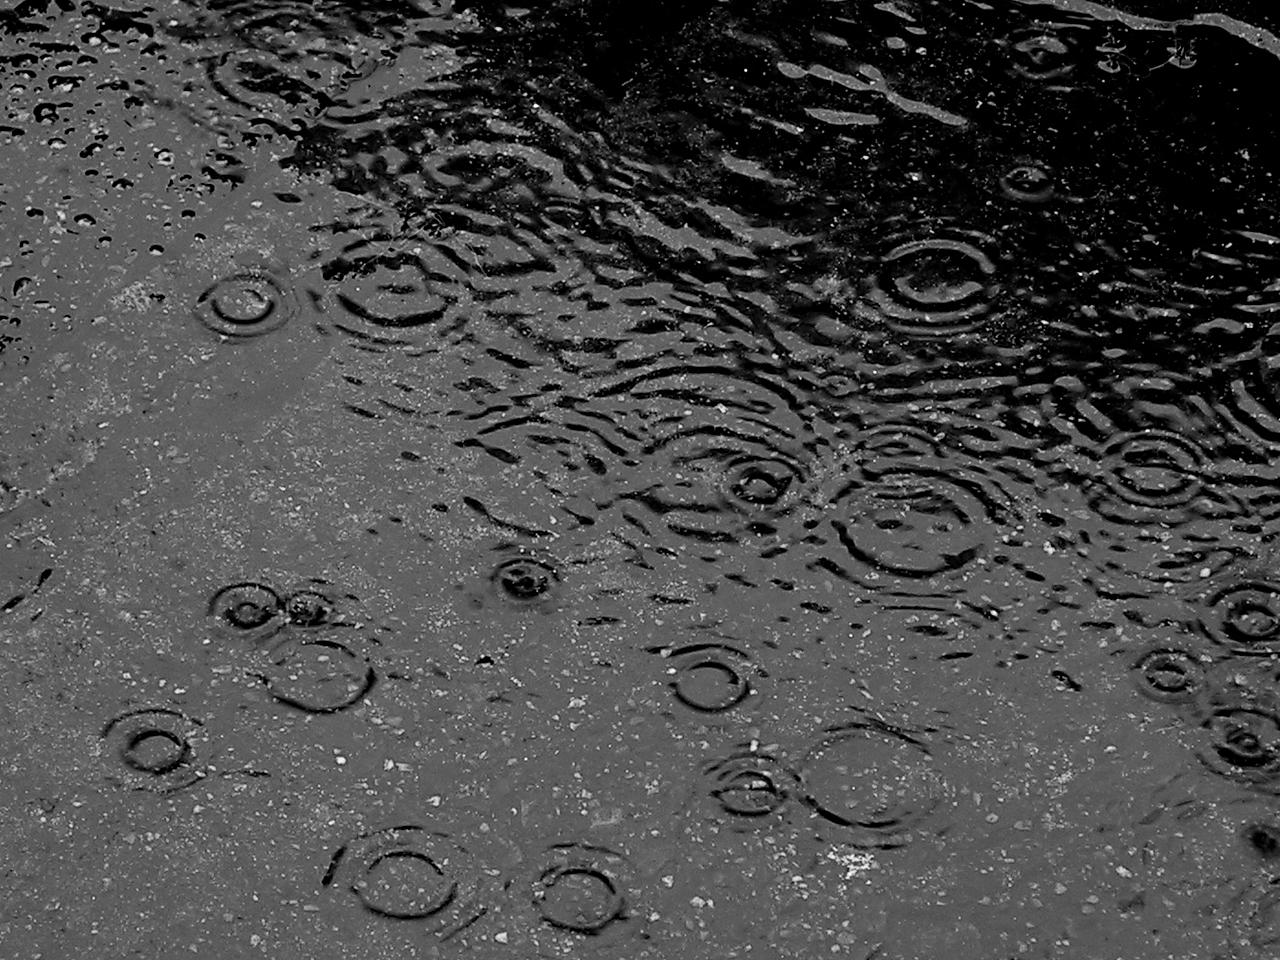 http://muslimsein.files.wordpress.com/2010/01/here_comes_rain_again1.jpg